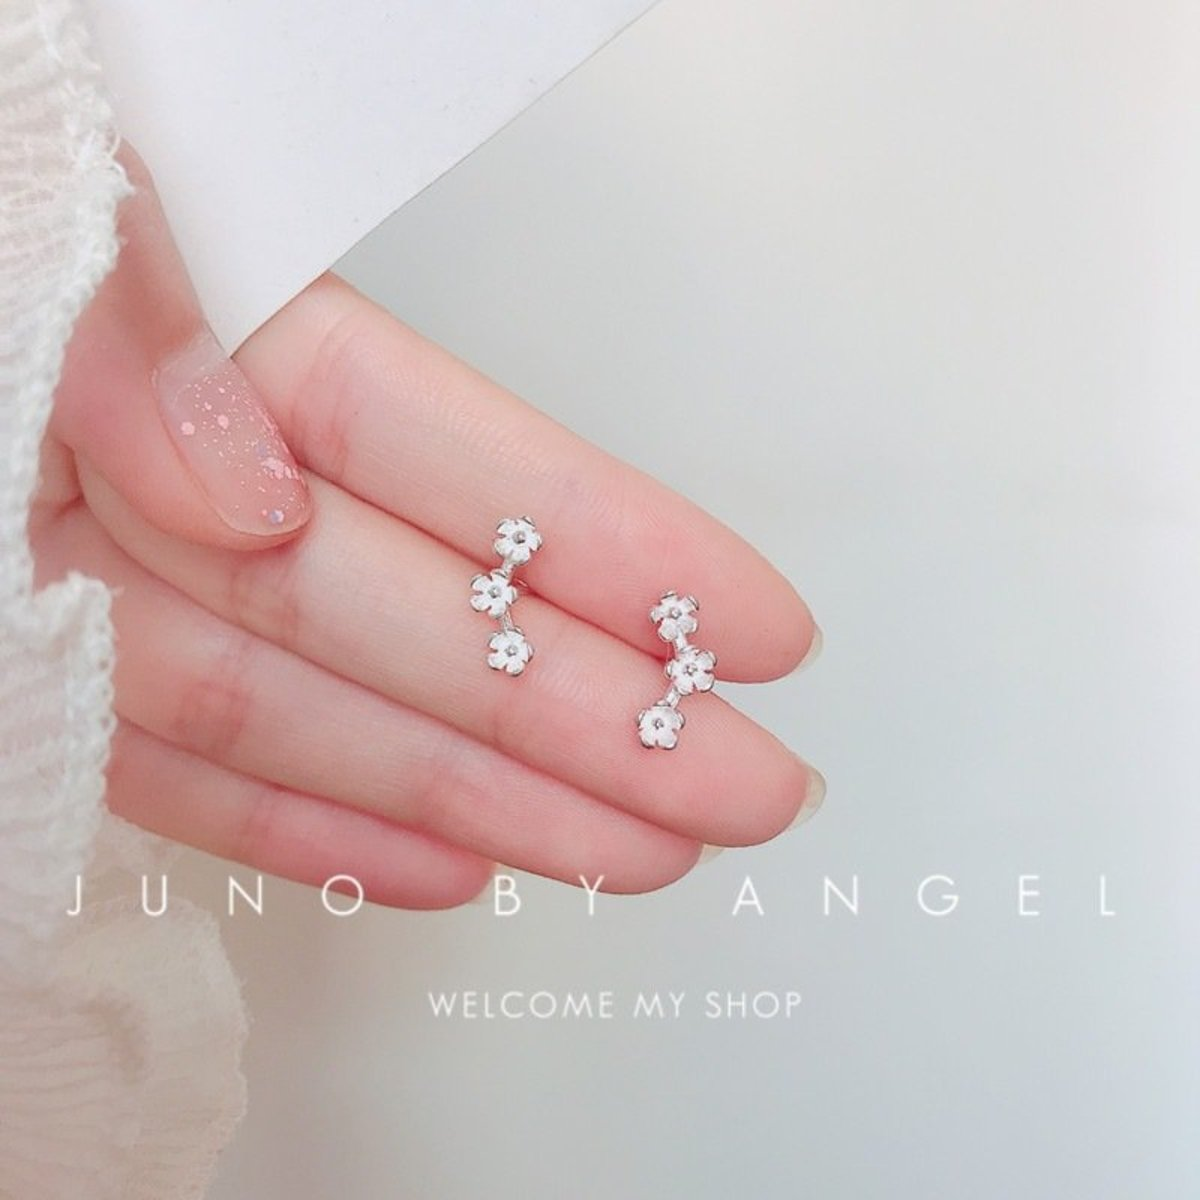 S925純銀日韓簡約防過敏耳釘耳環(三連小花)